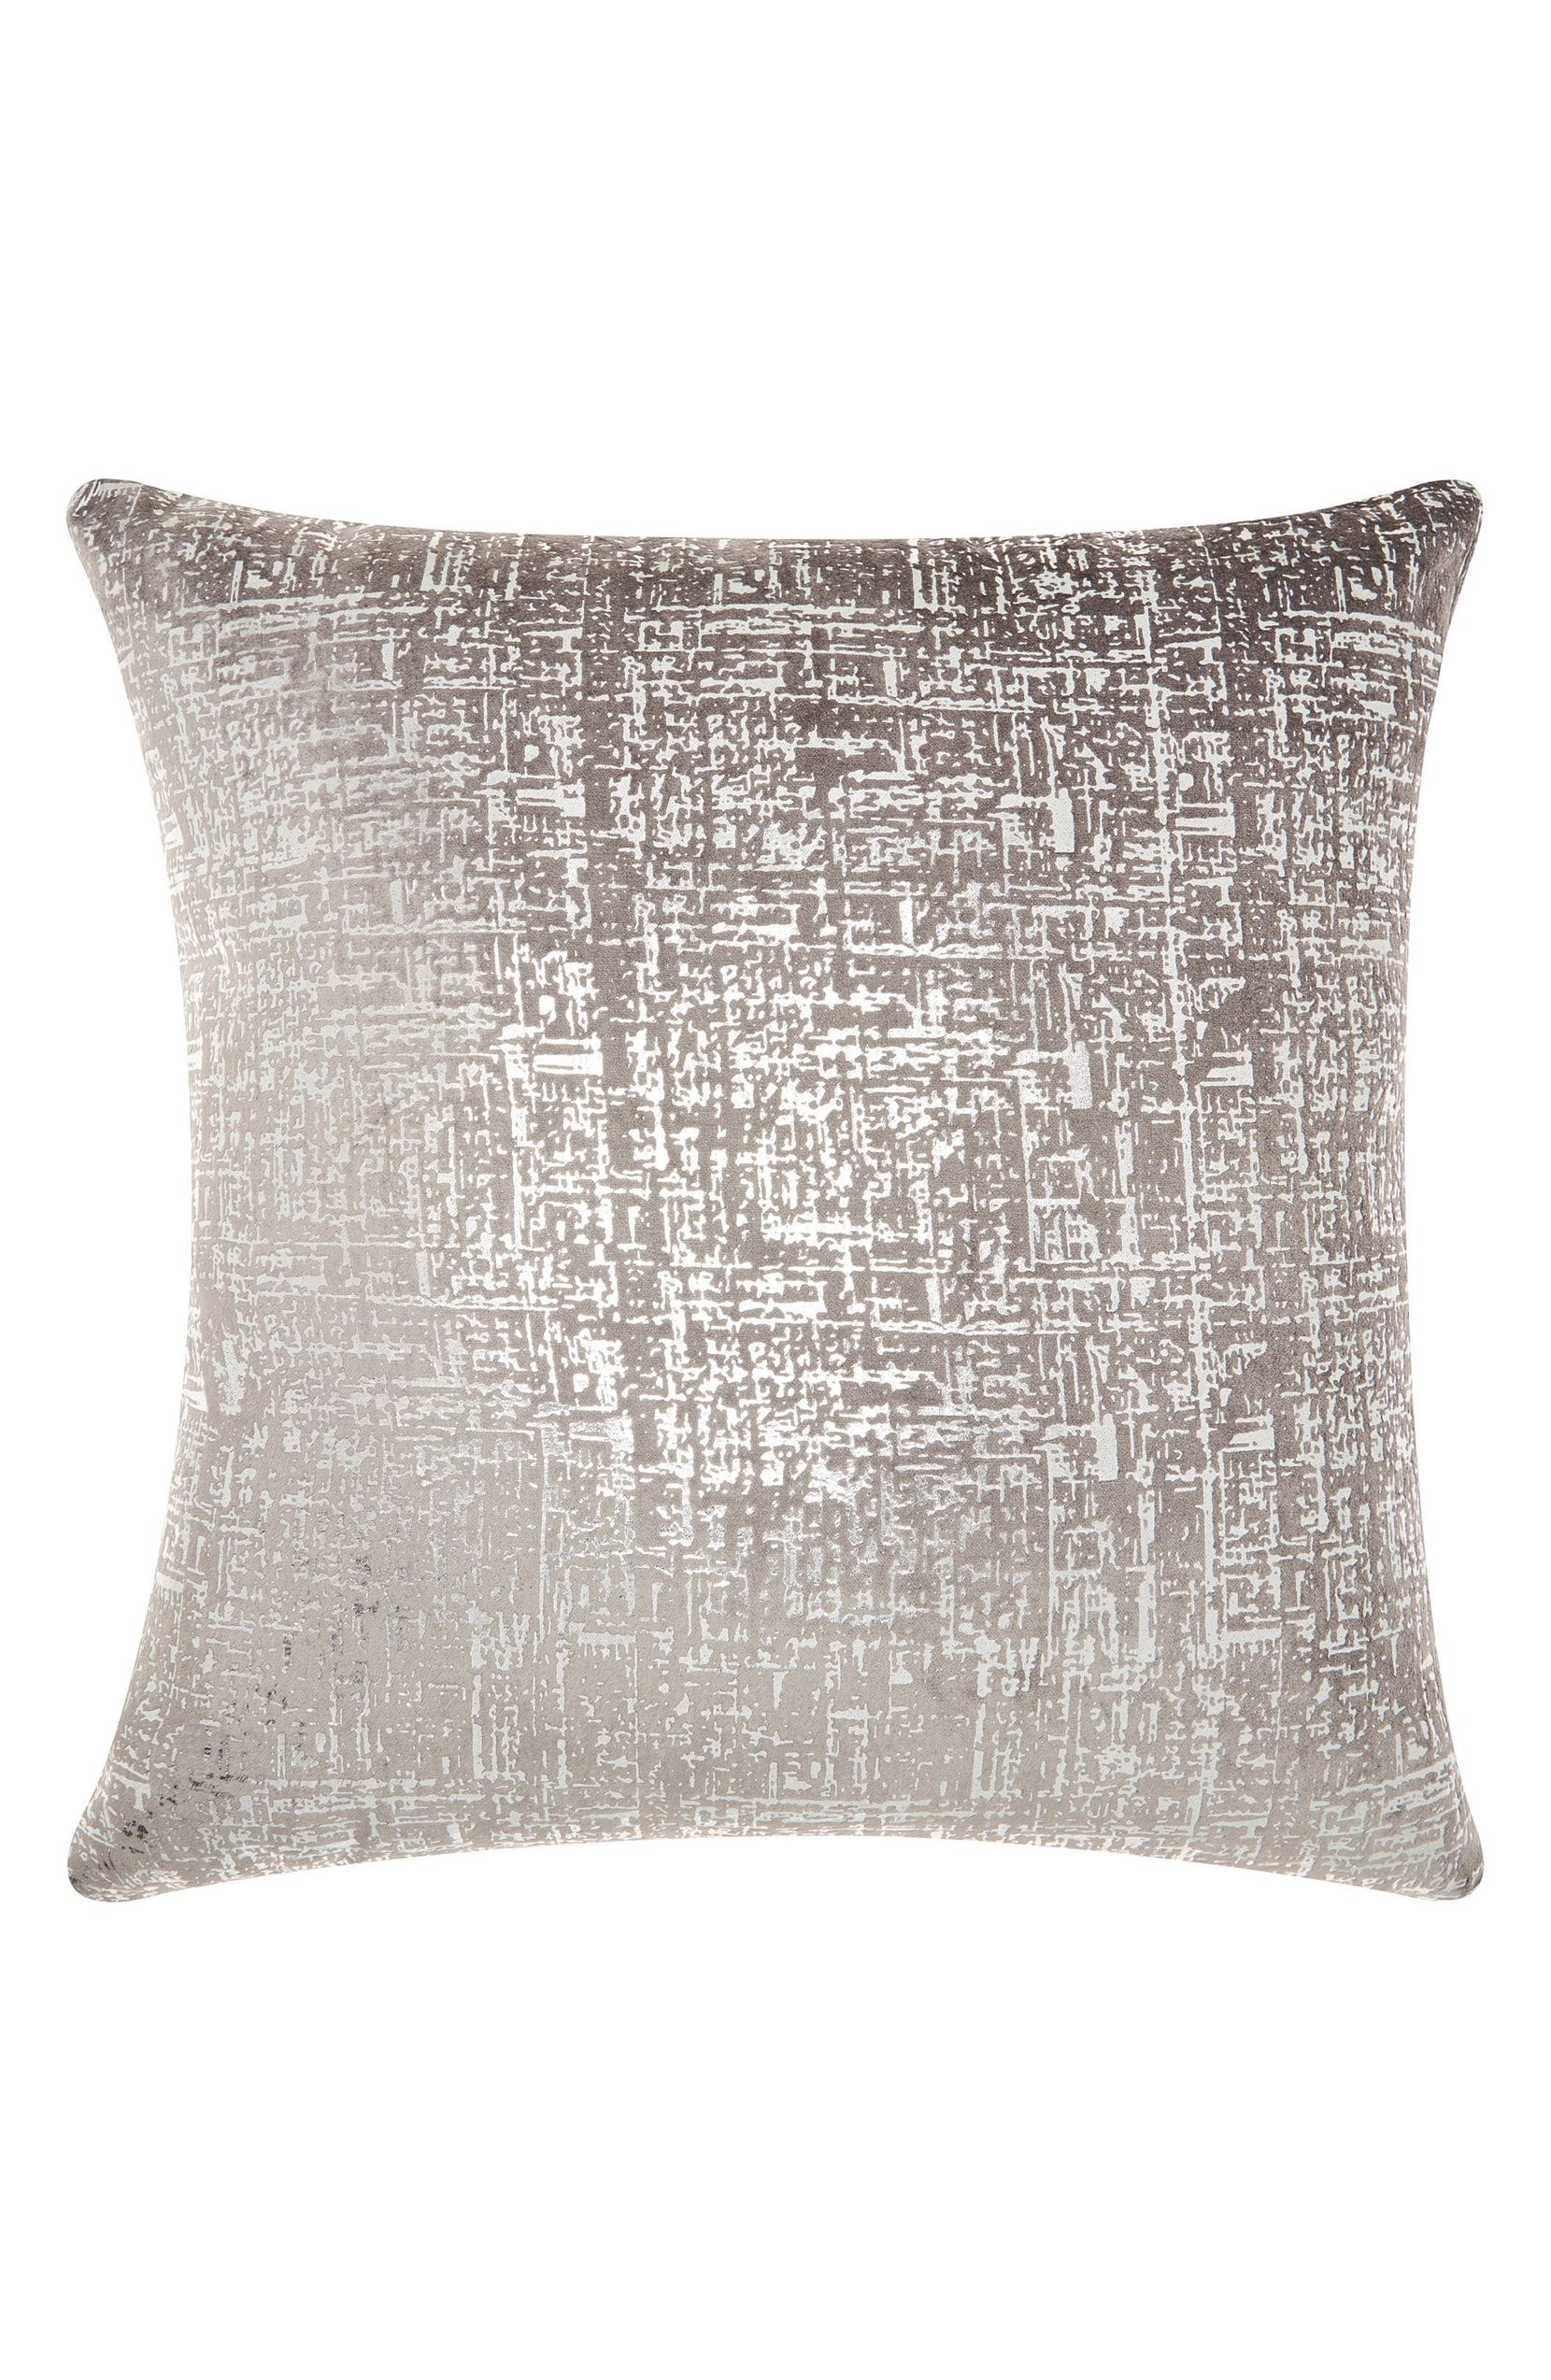 b7dfdf289b3b1 Distressed Velvet Accent Pillow